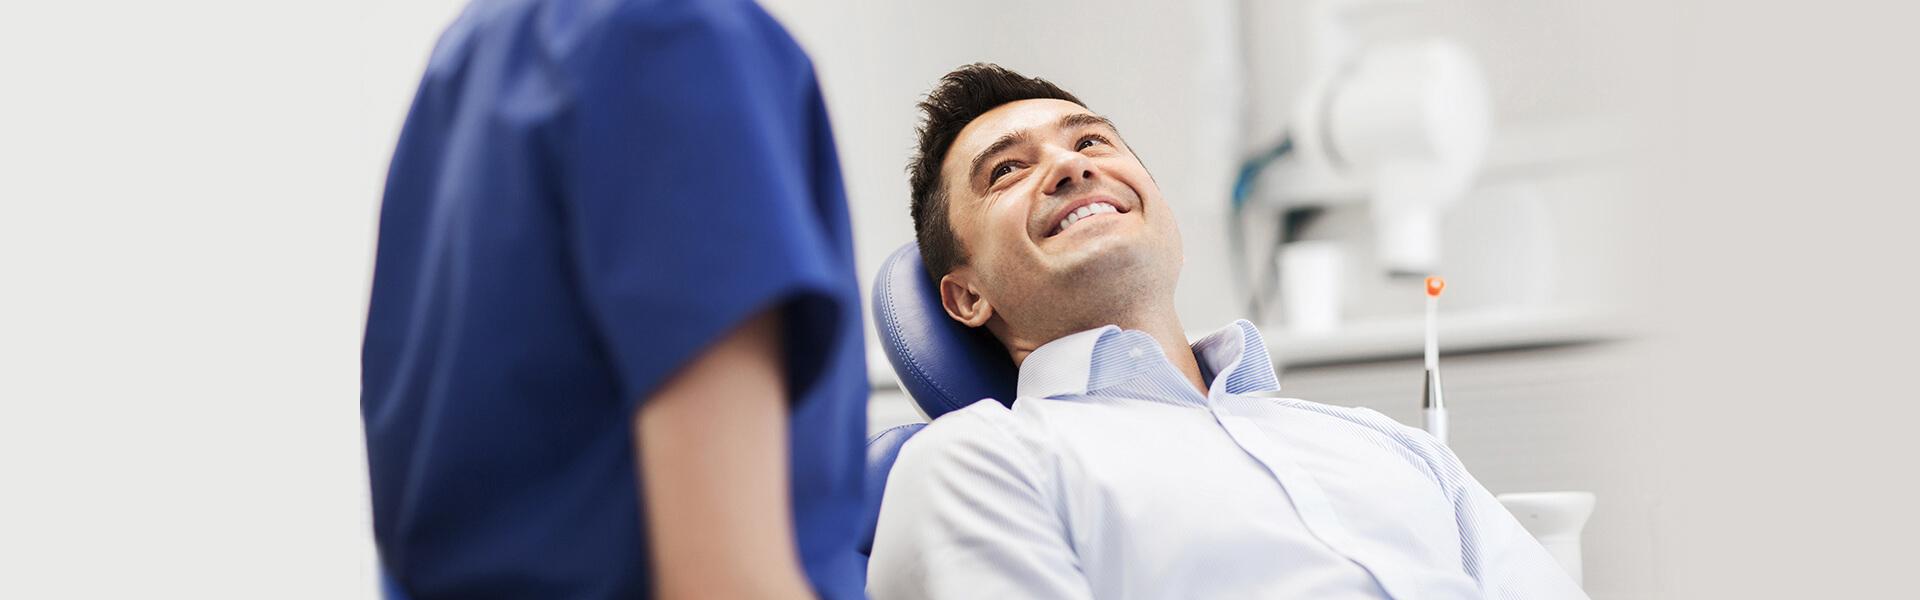 Gum Disease Treatment Options